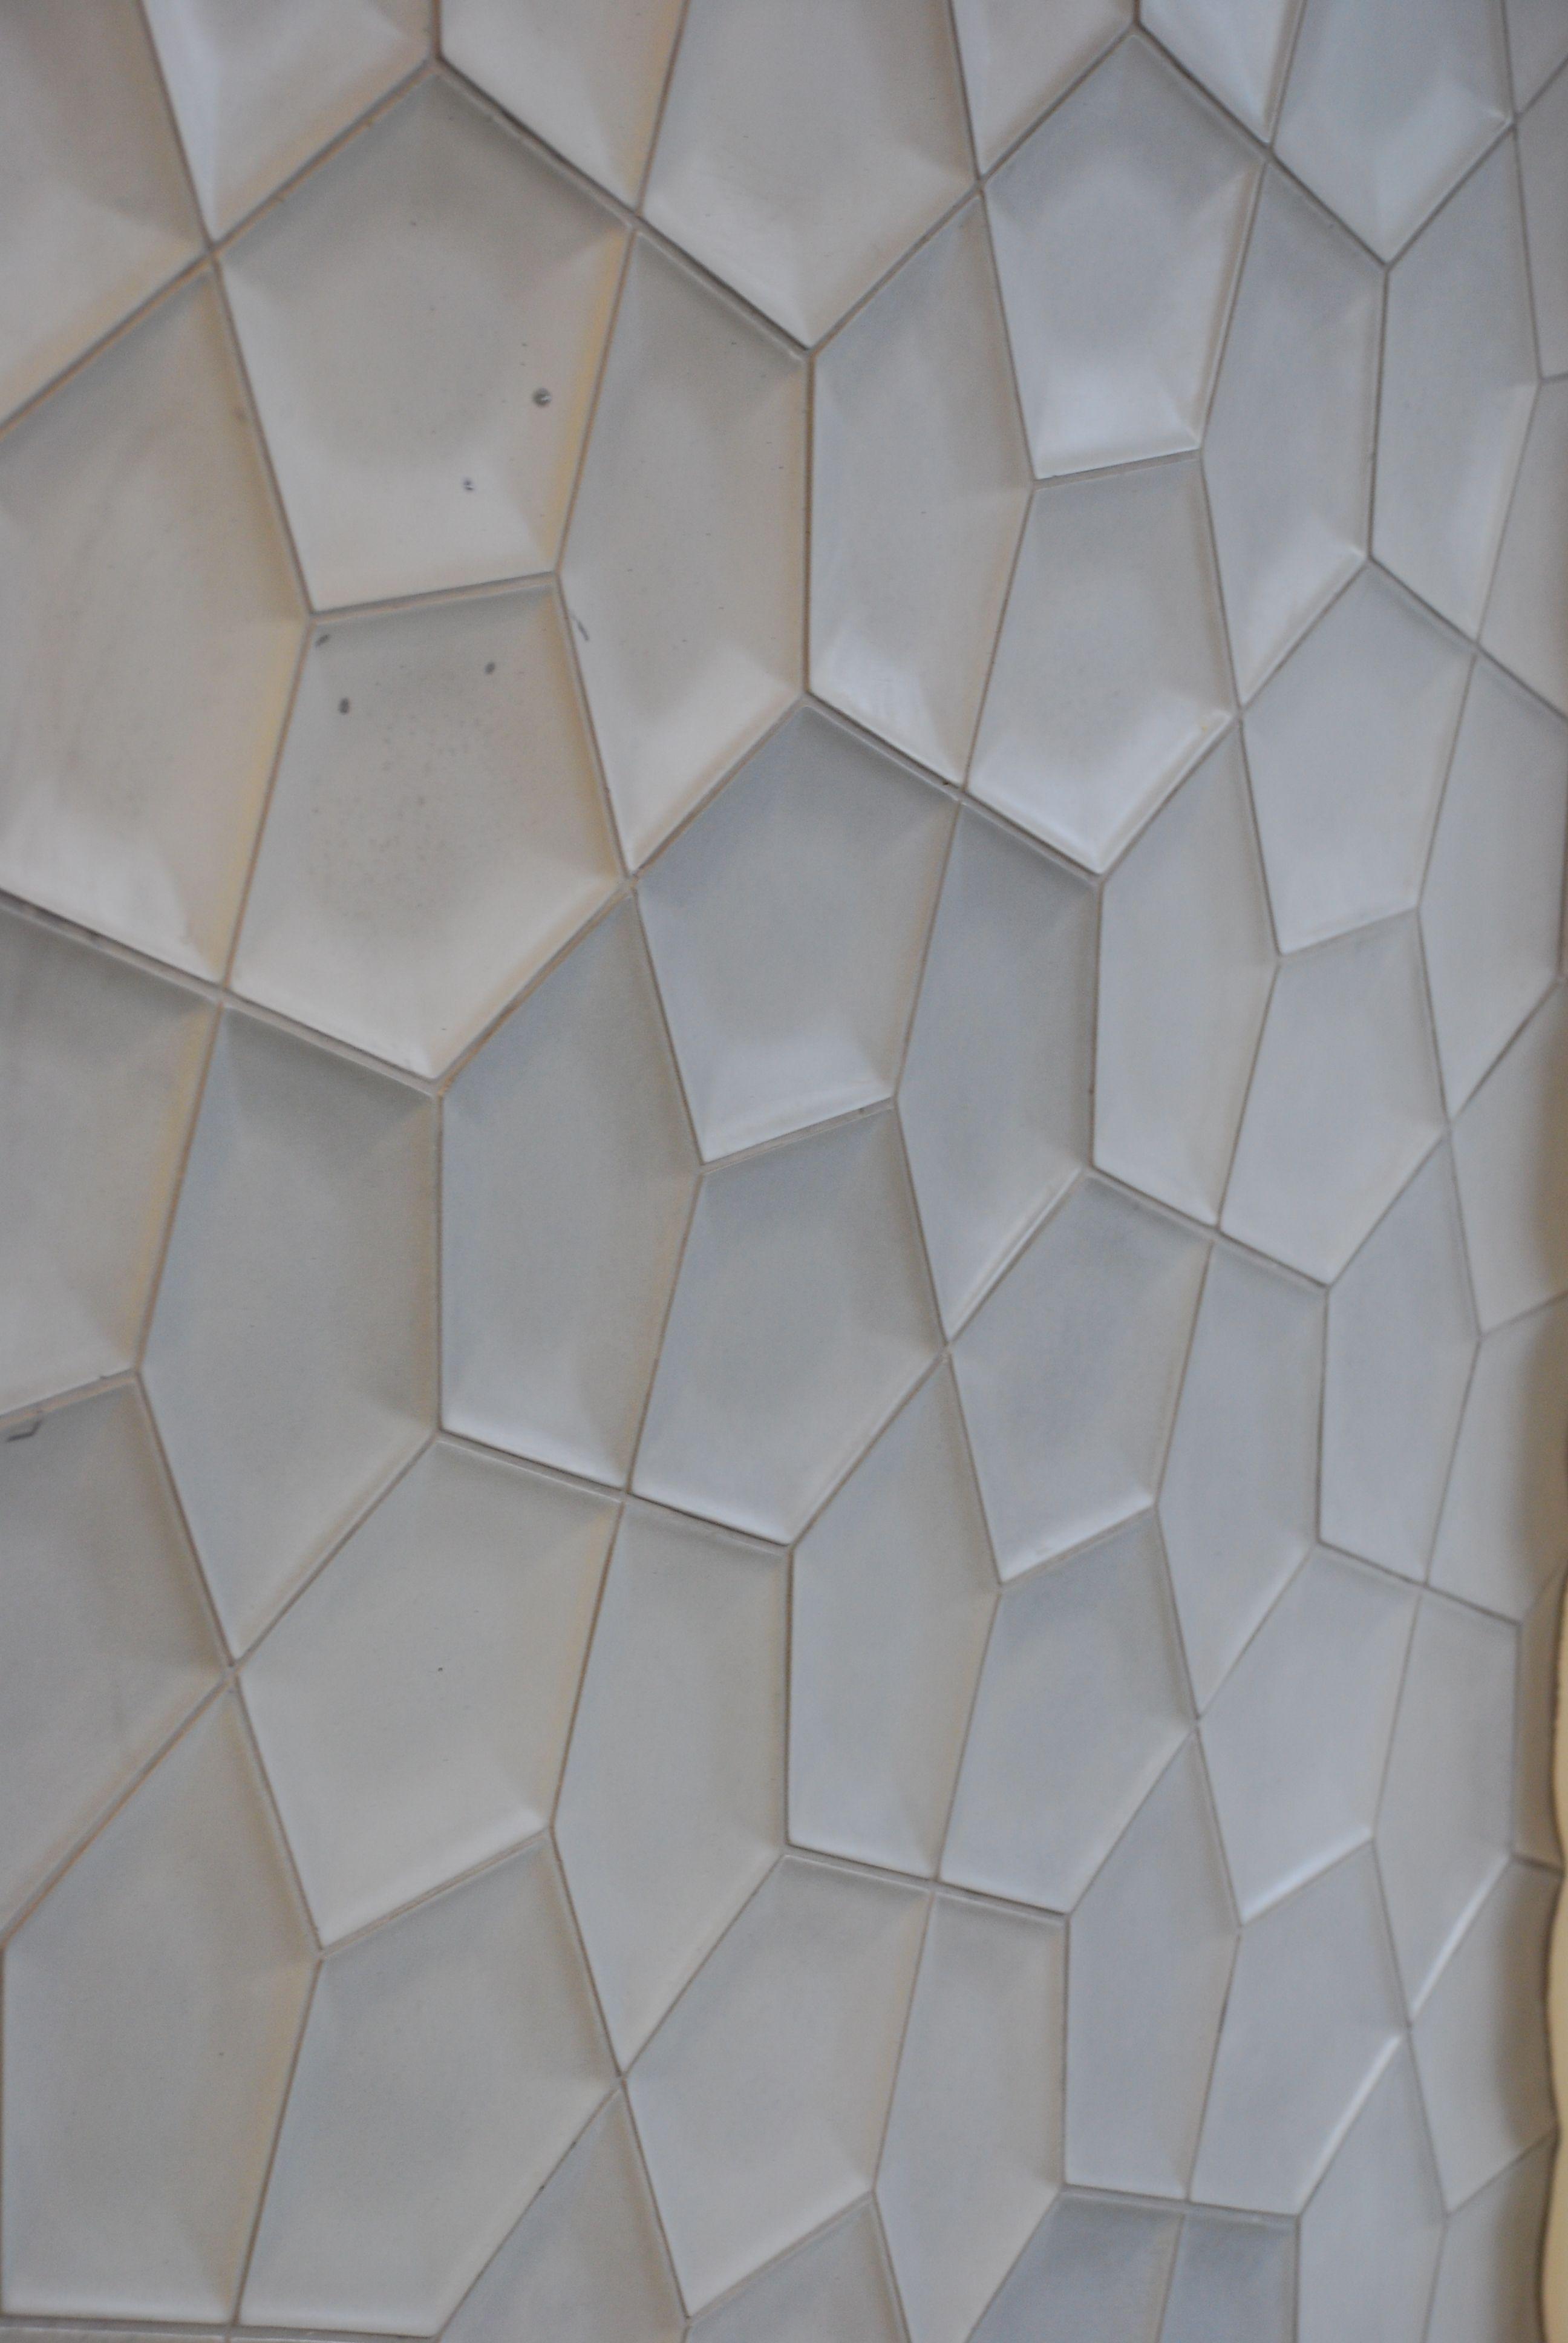 Concrete Tiles Pental Tiles Three Dimensional Space Tiles Geometric Pattern 3d Tiles